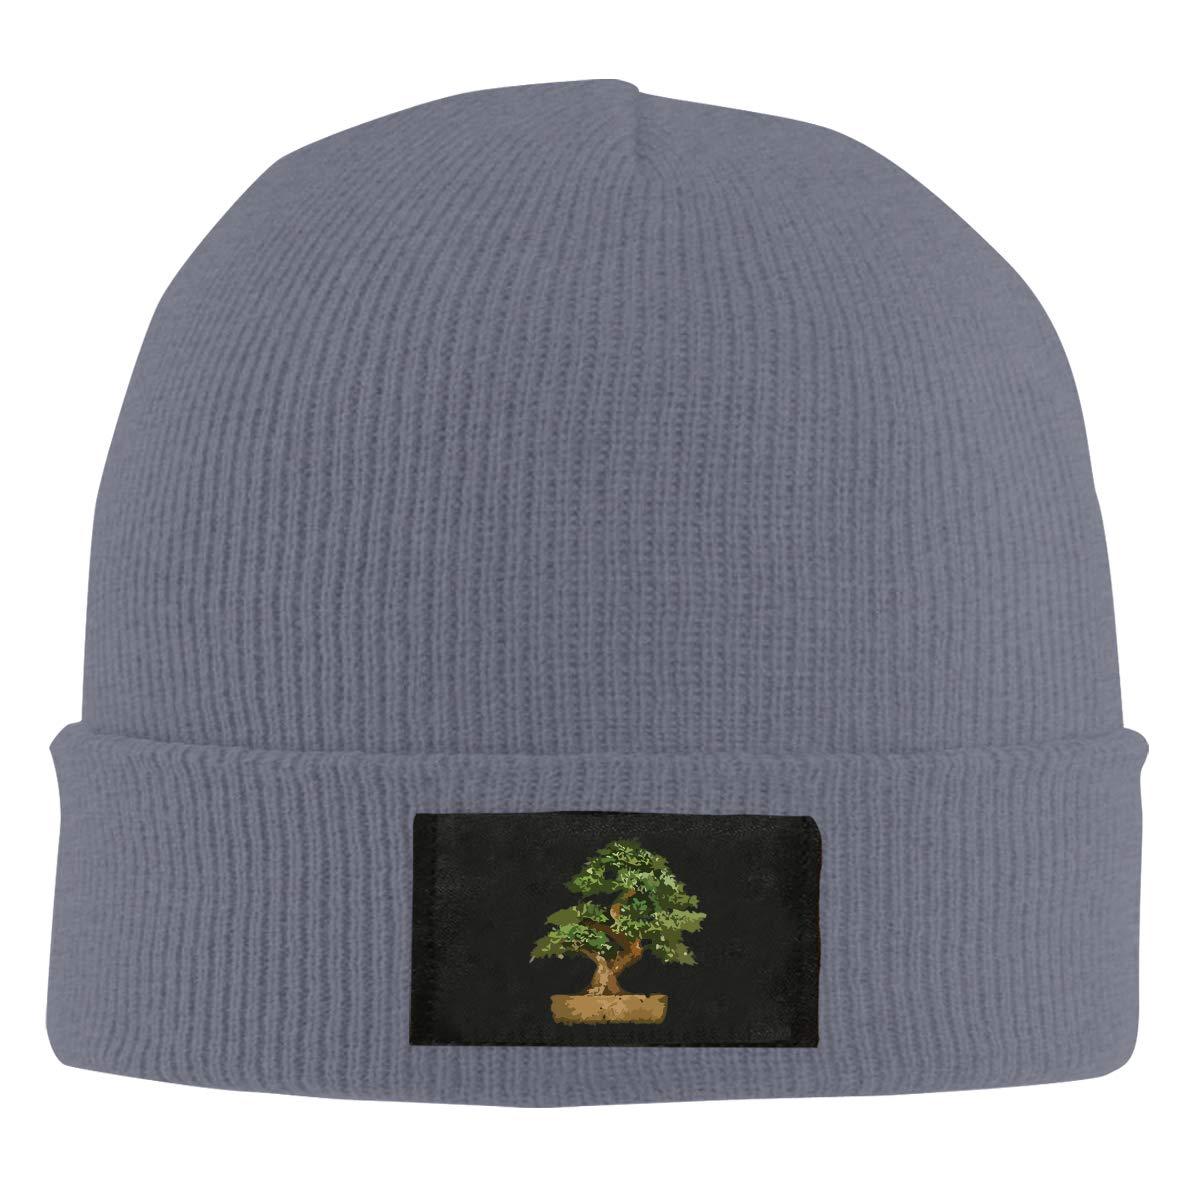 LRHUI Tree Winter Knitted Hat Warm Wool Skull Beanie Cap